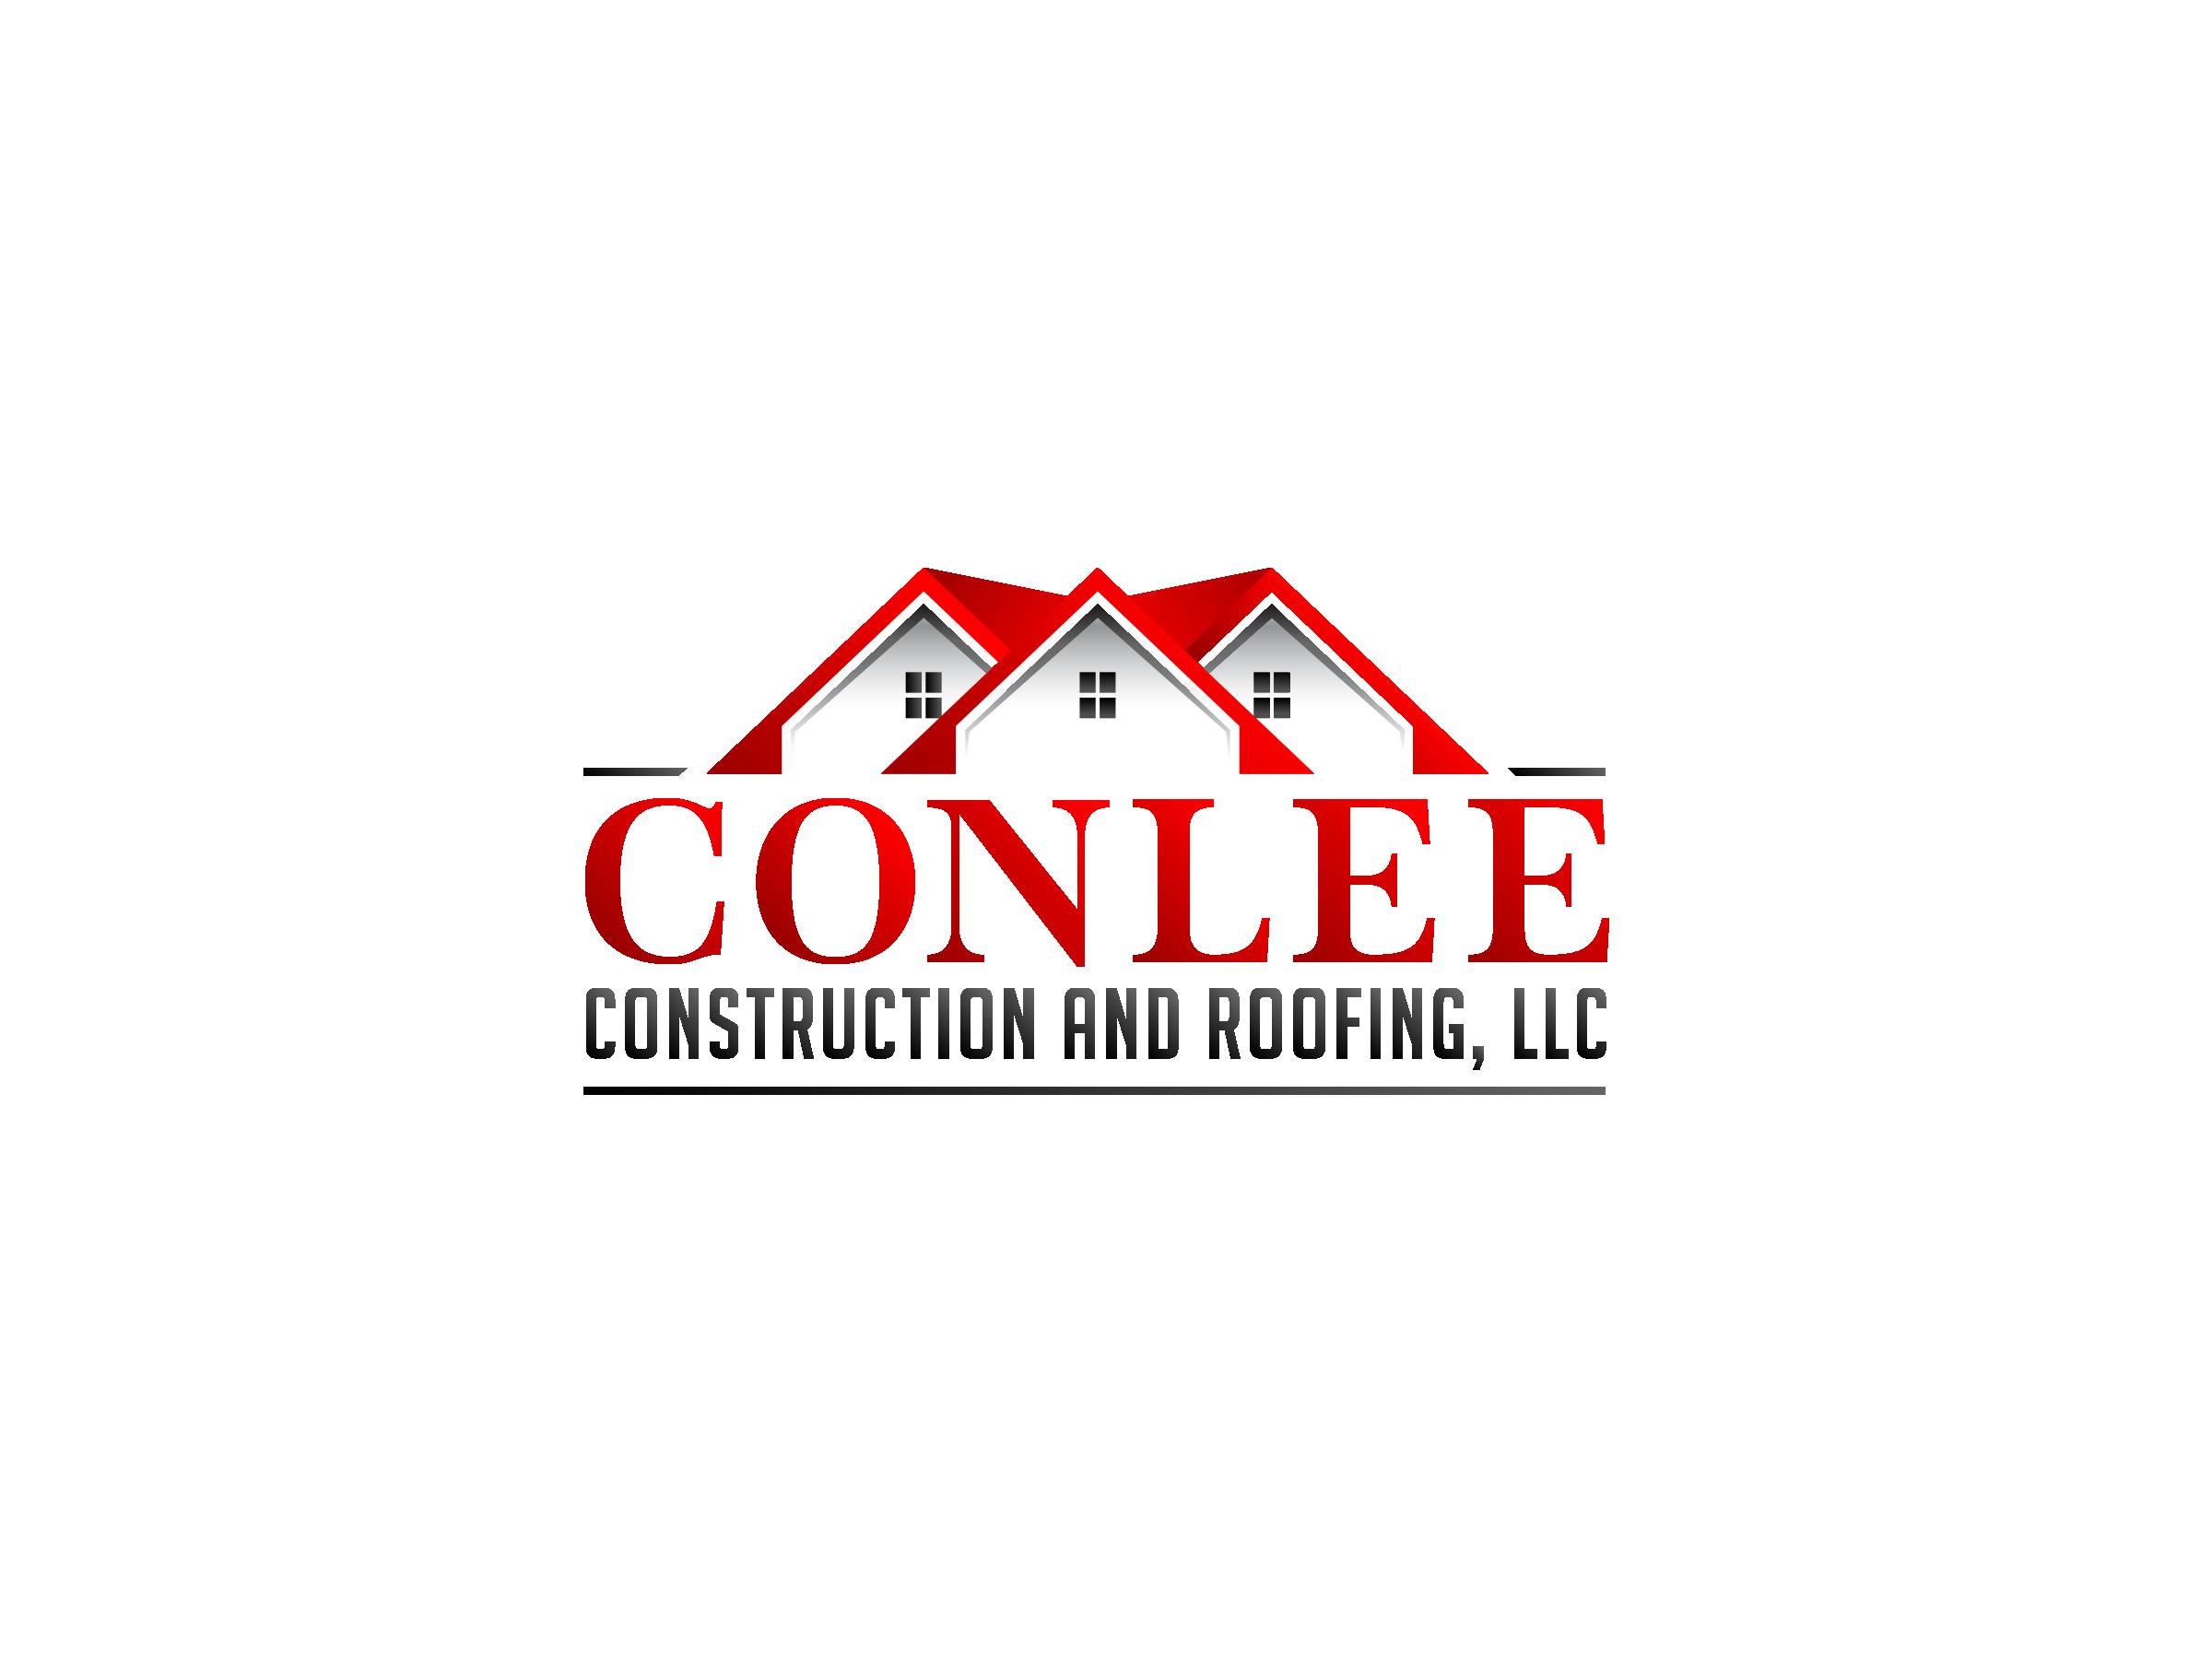 Conlee201_1